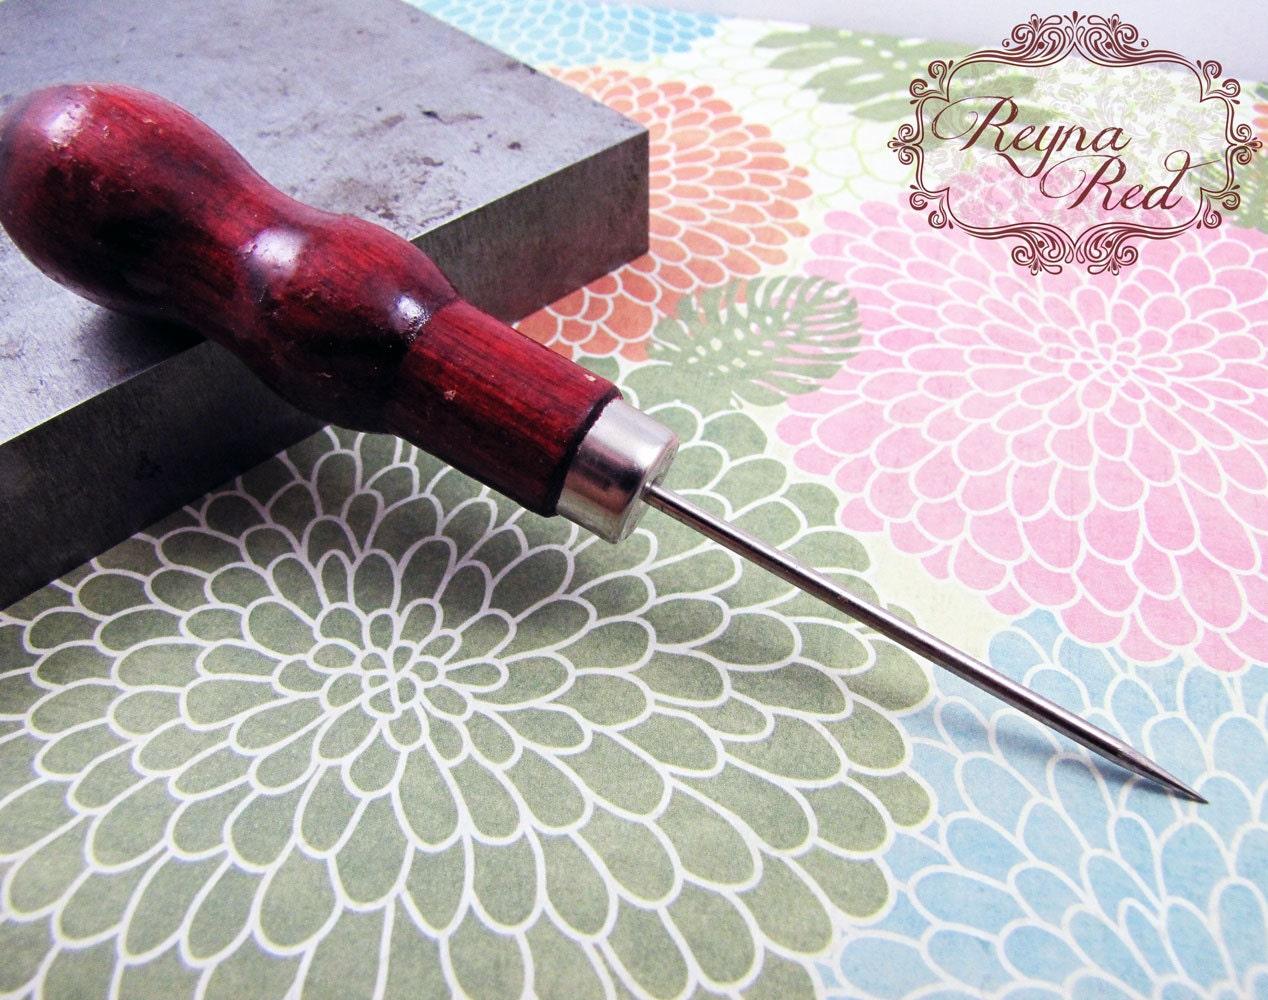 beading awl wood handle steel awl beading tool jewelry